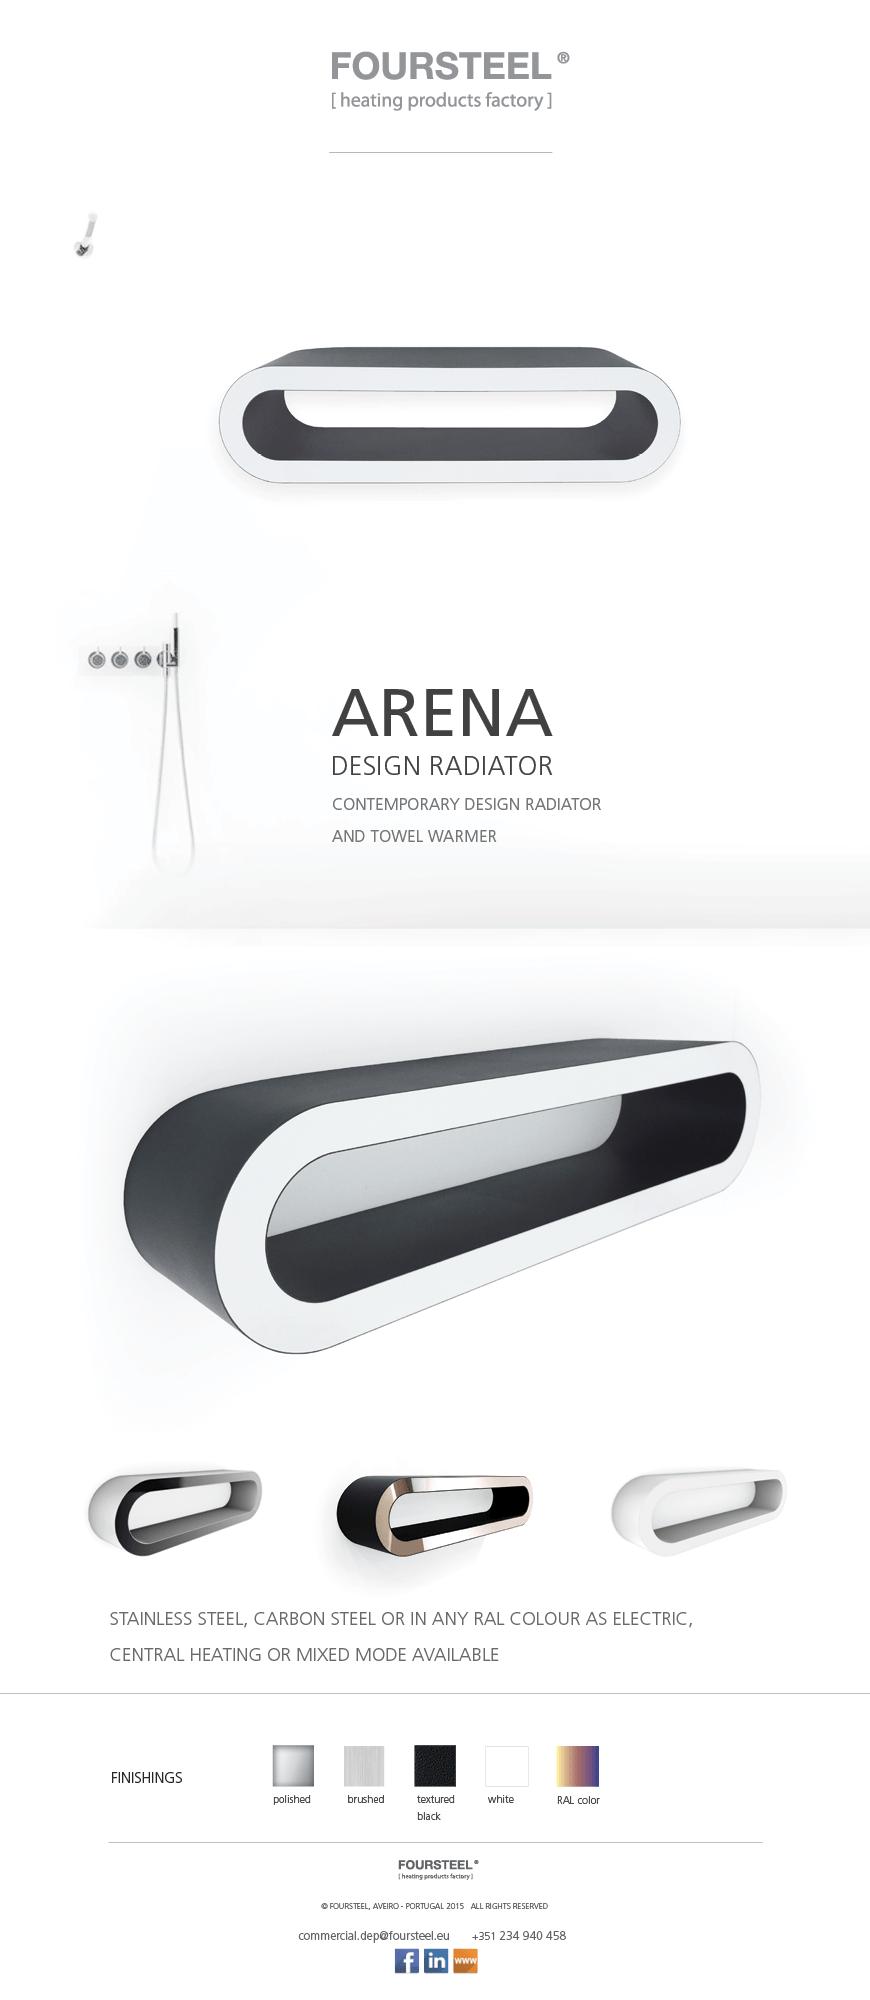 arena - apr 2015